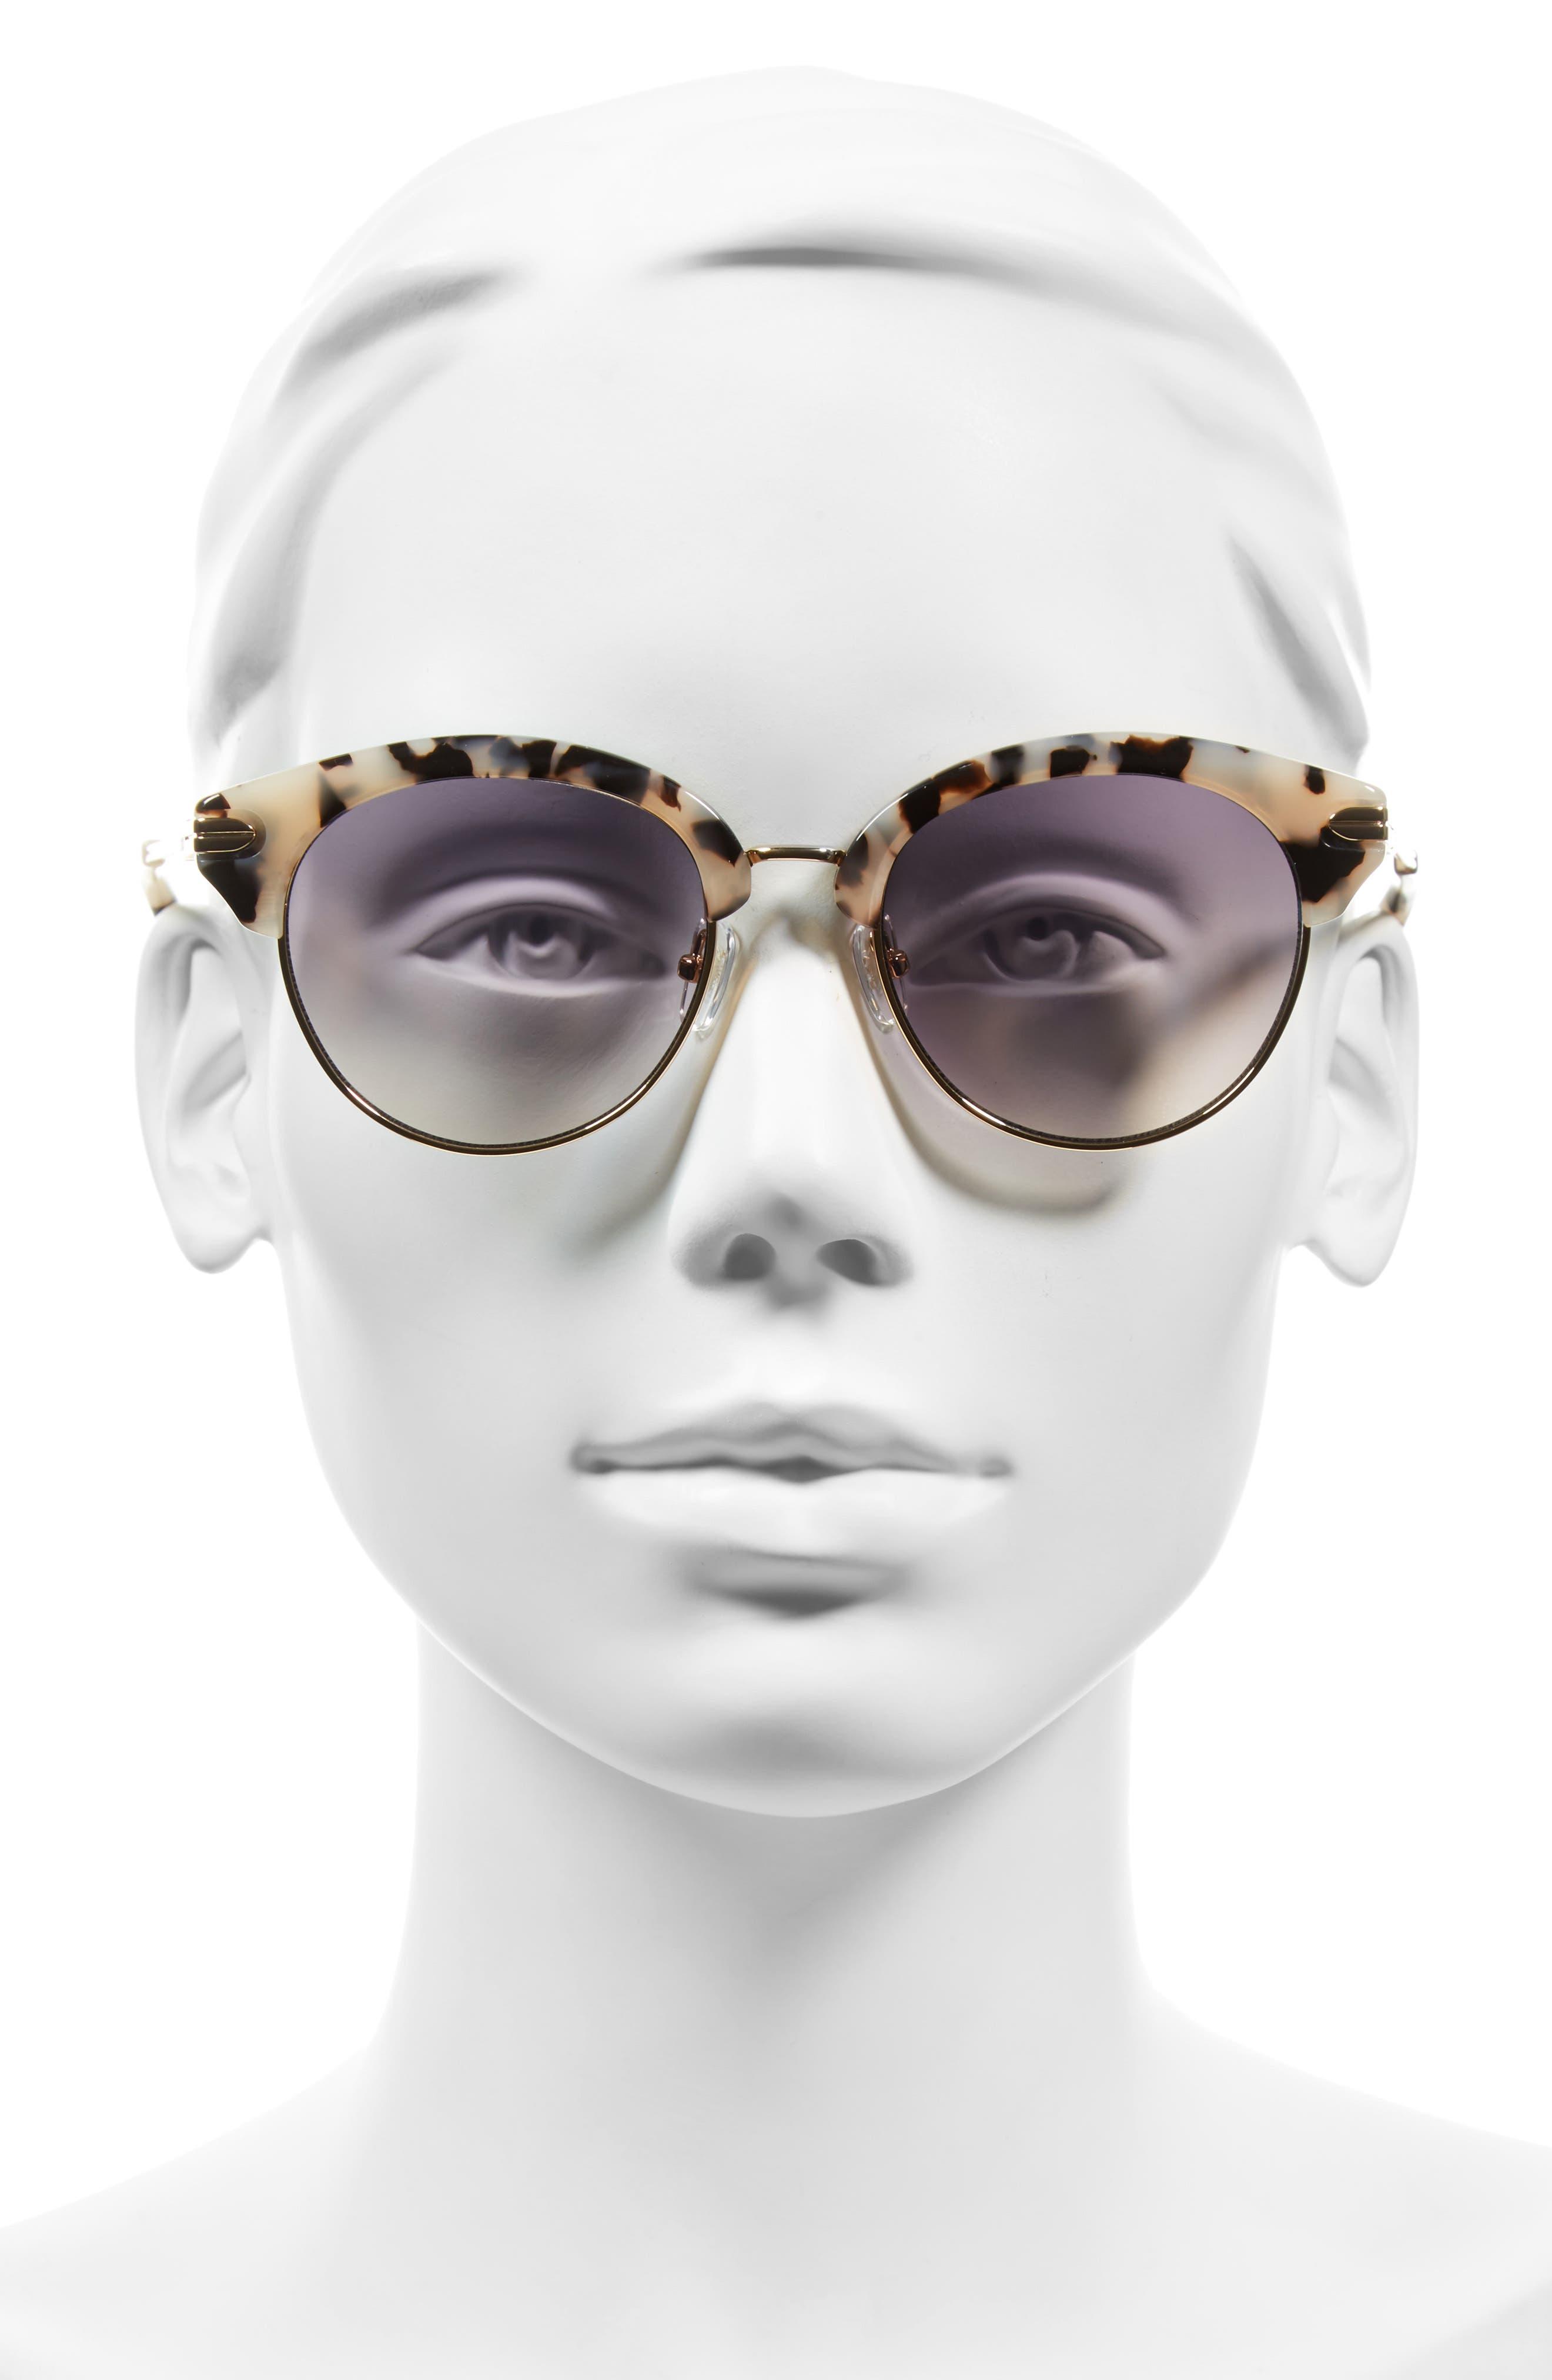 Bellevue 50mm Mirrored Sunglasses,                             Alternate thumbnail 2, color,                             200